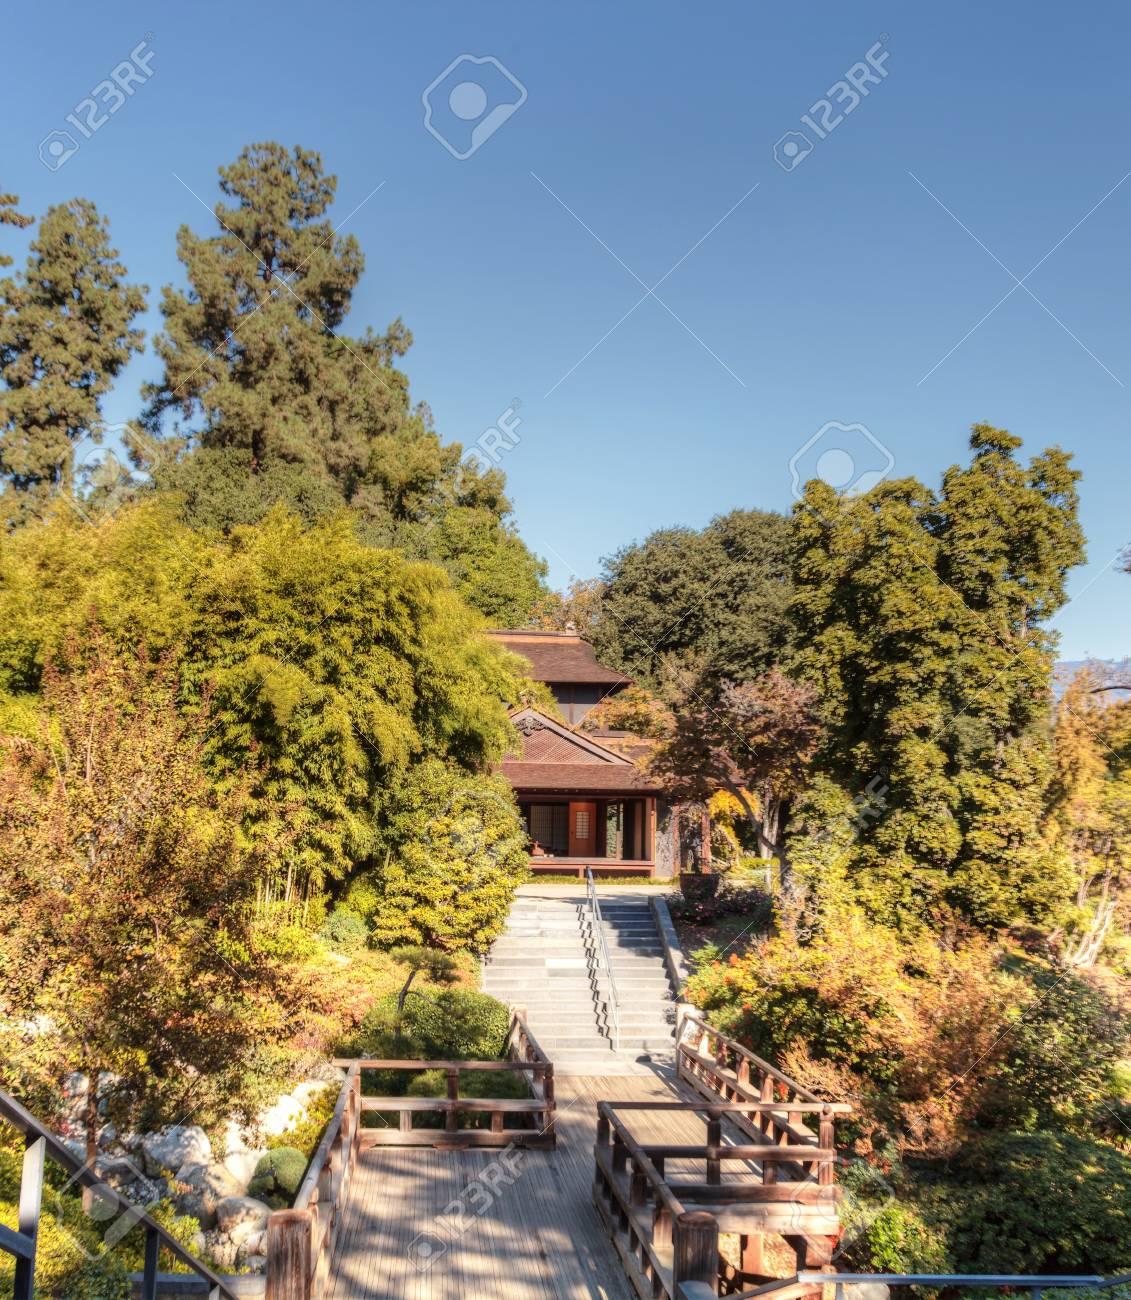 Los Angeles Ca Usa November 25 2016 Garden Tea Room With